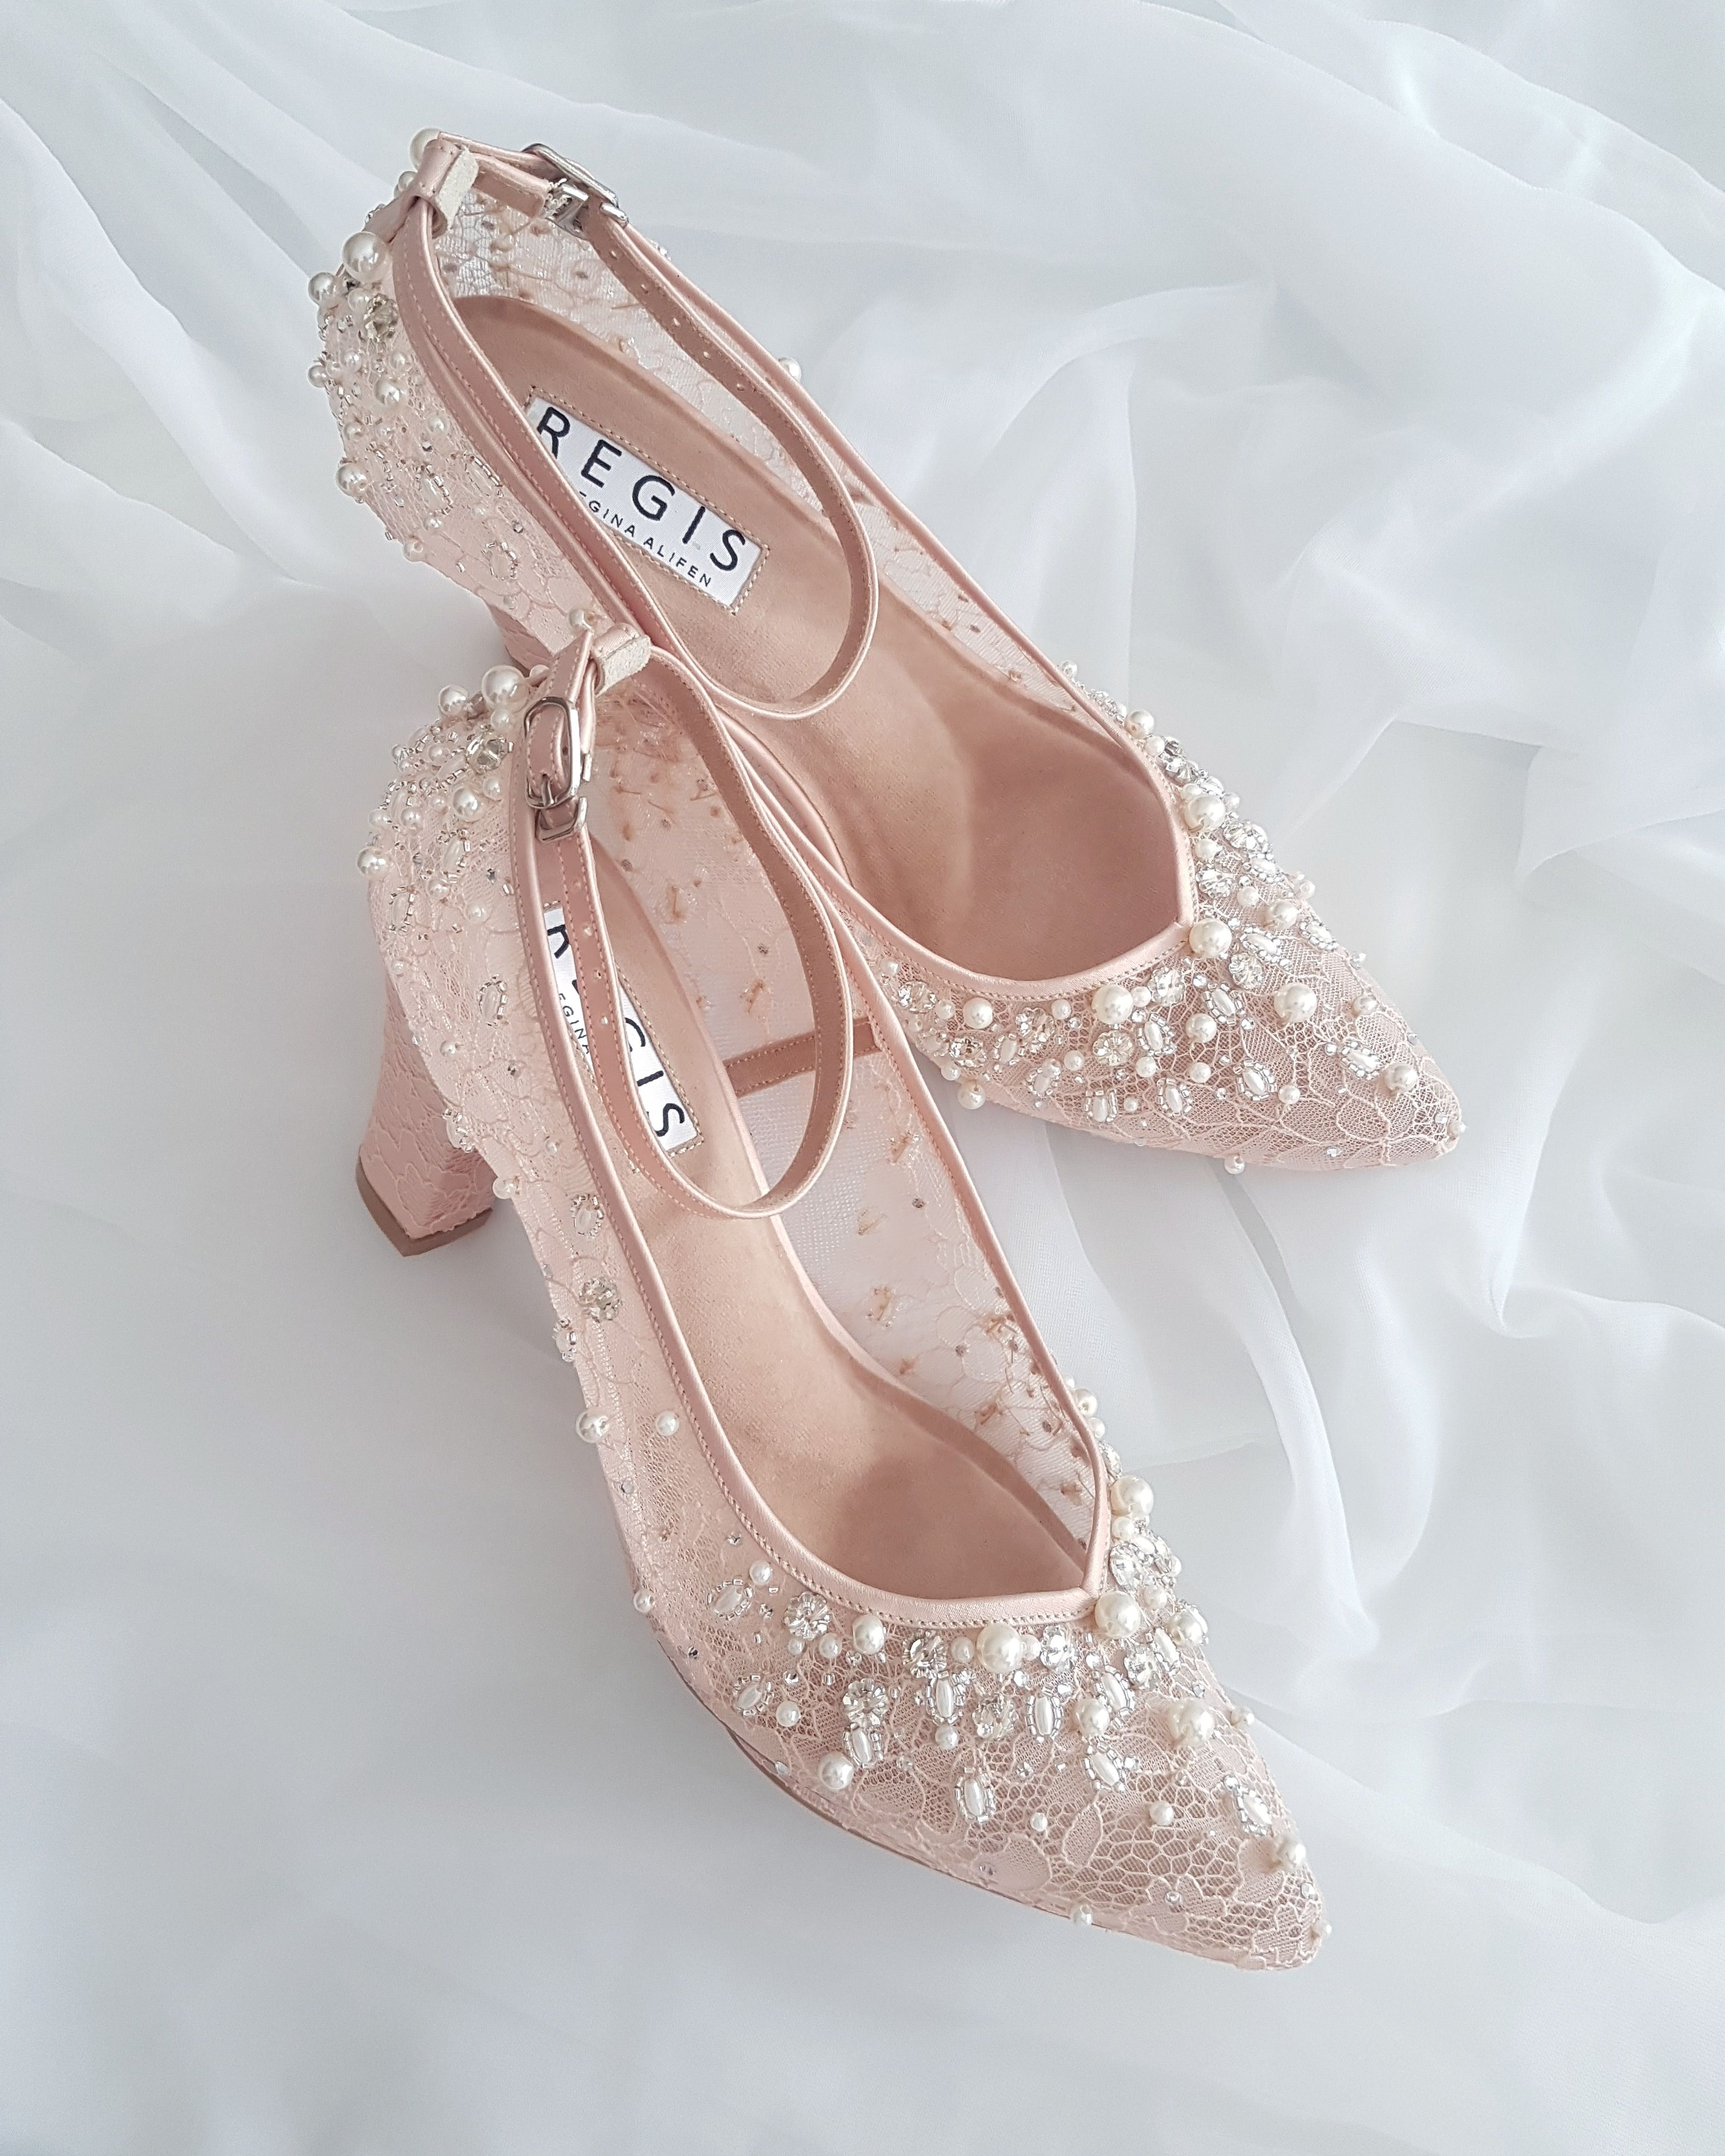 Ini Luar Biasa Karya Hebat Dari Regis Bridal Shoes Https Www Bridestory Com Id Regis Bridal Shoes Projects R Sepatu Pengantin Sepatu Wanita Sepatu Perempuan